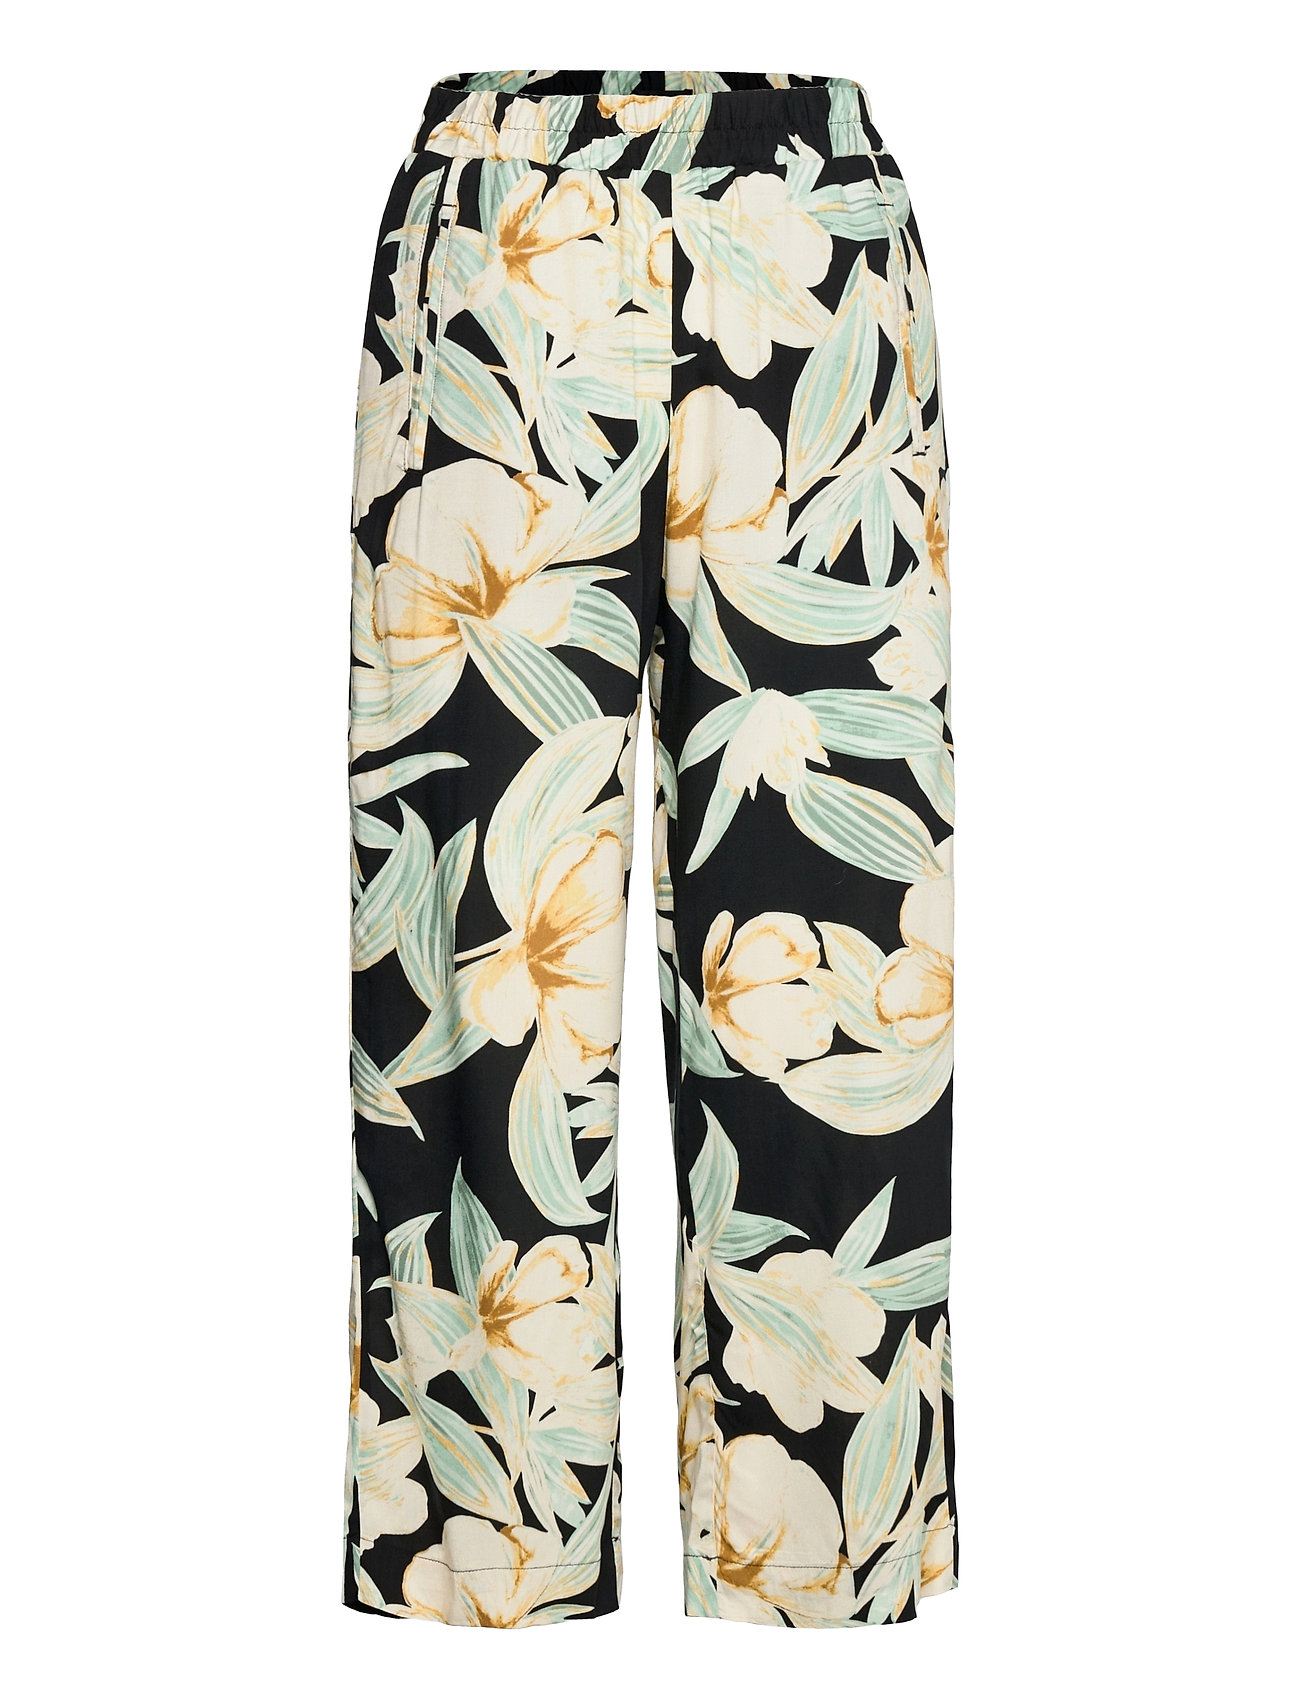 Trousers Bella Aop Casual Bukser Multi/mønstret Lindex